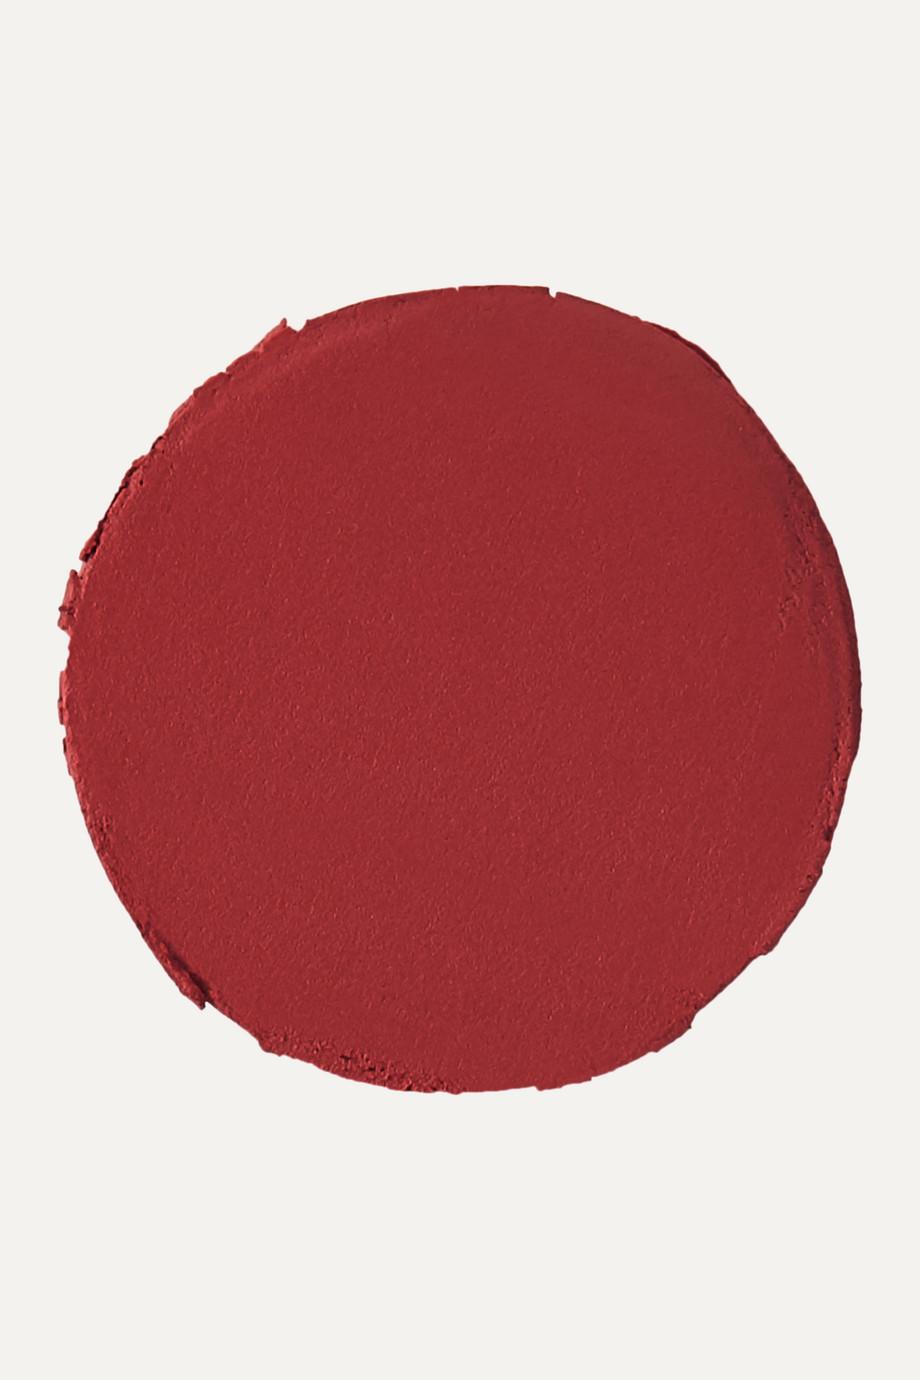 Shiseido ModernMatte Powder Lipstick – Mellow Drama 515 – Lippenstift